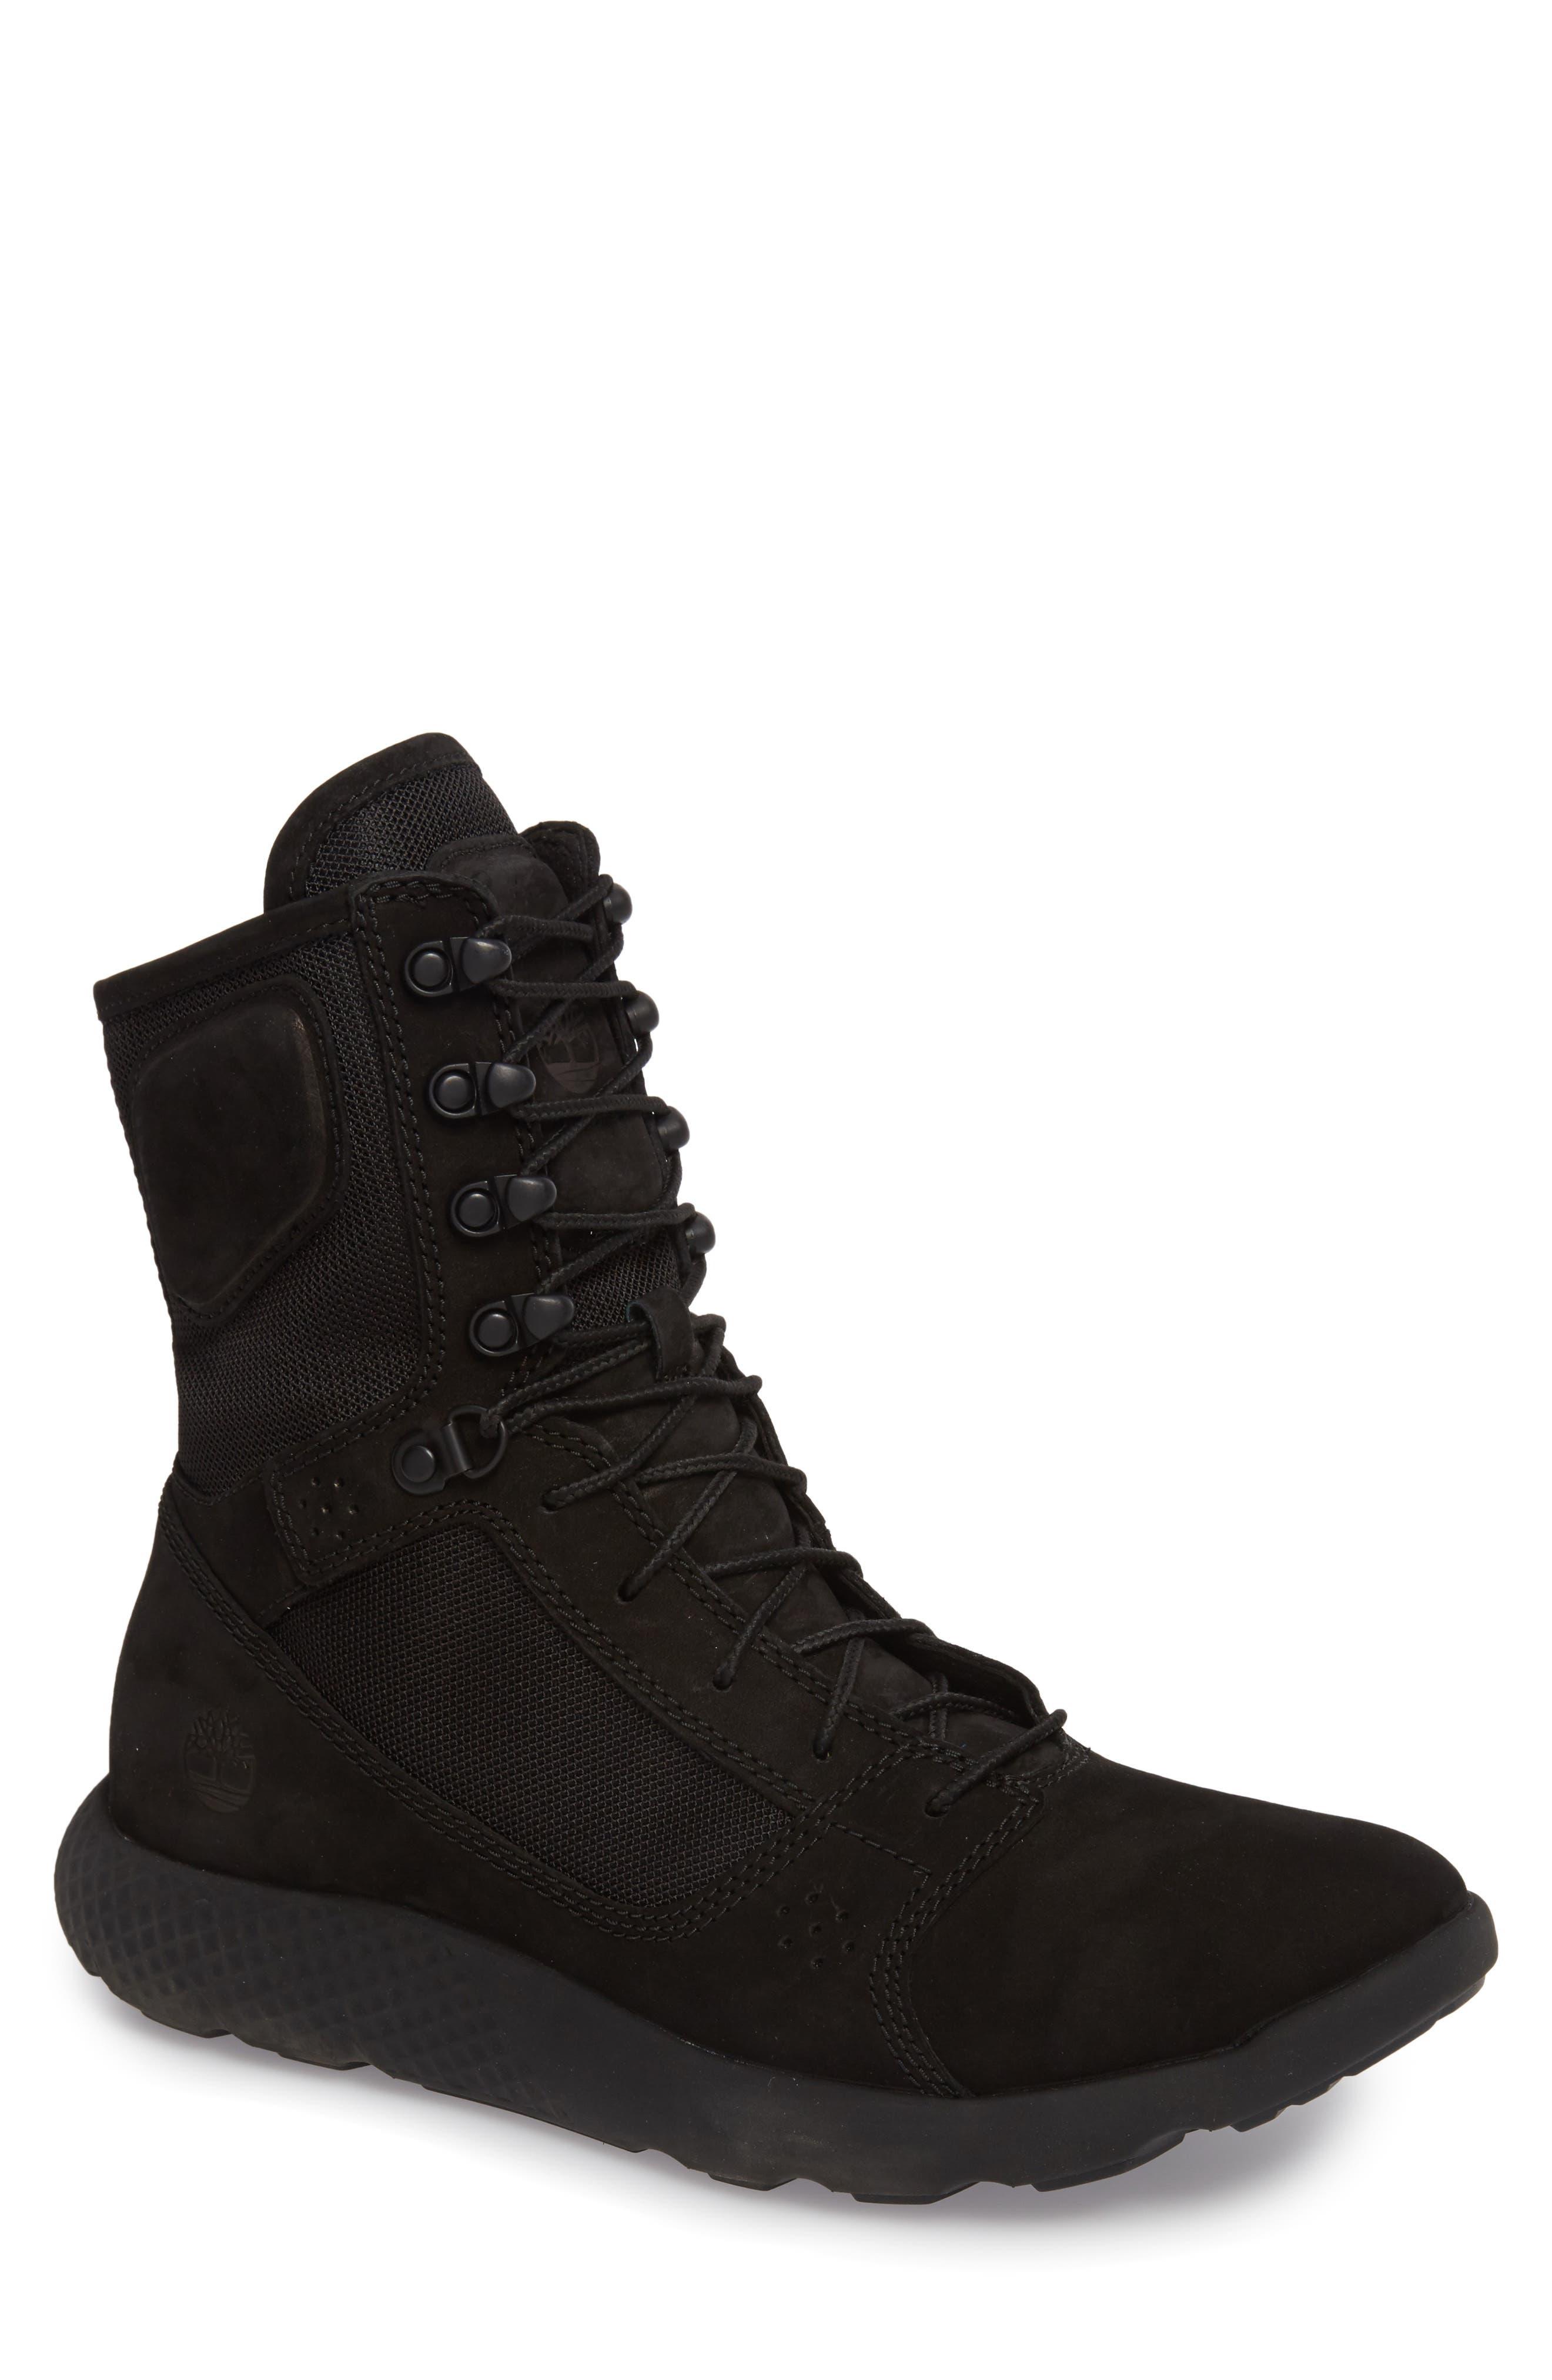 FlyRoam Tactical Boot,                         Main,                         color, 001